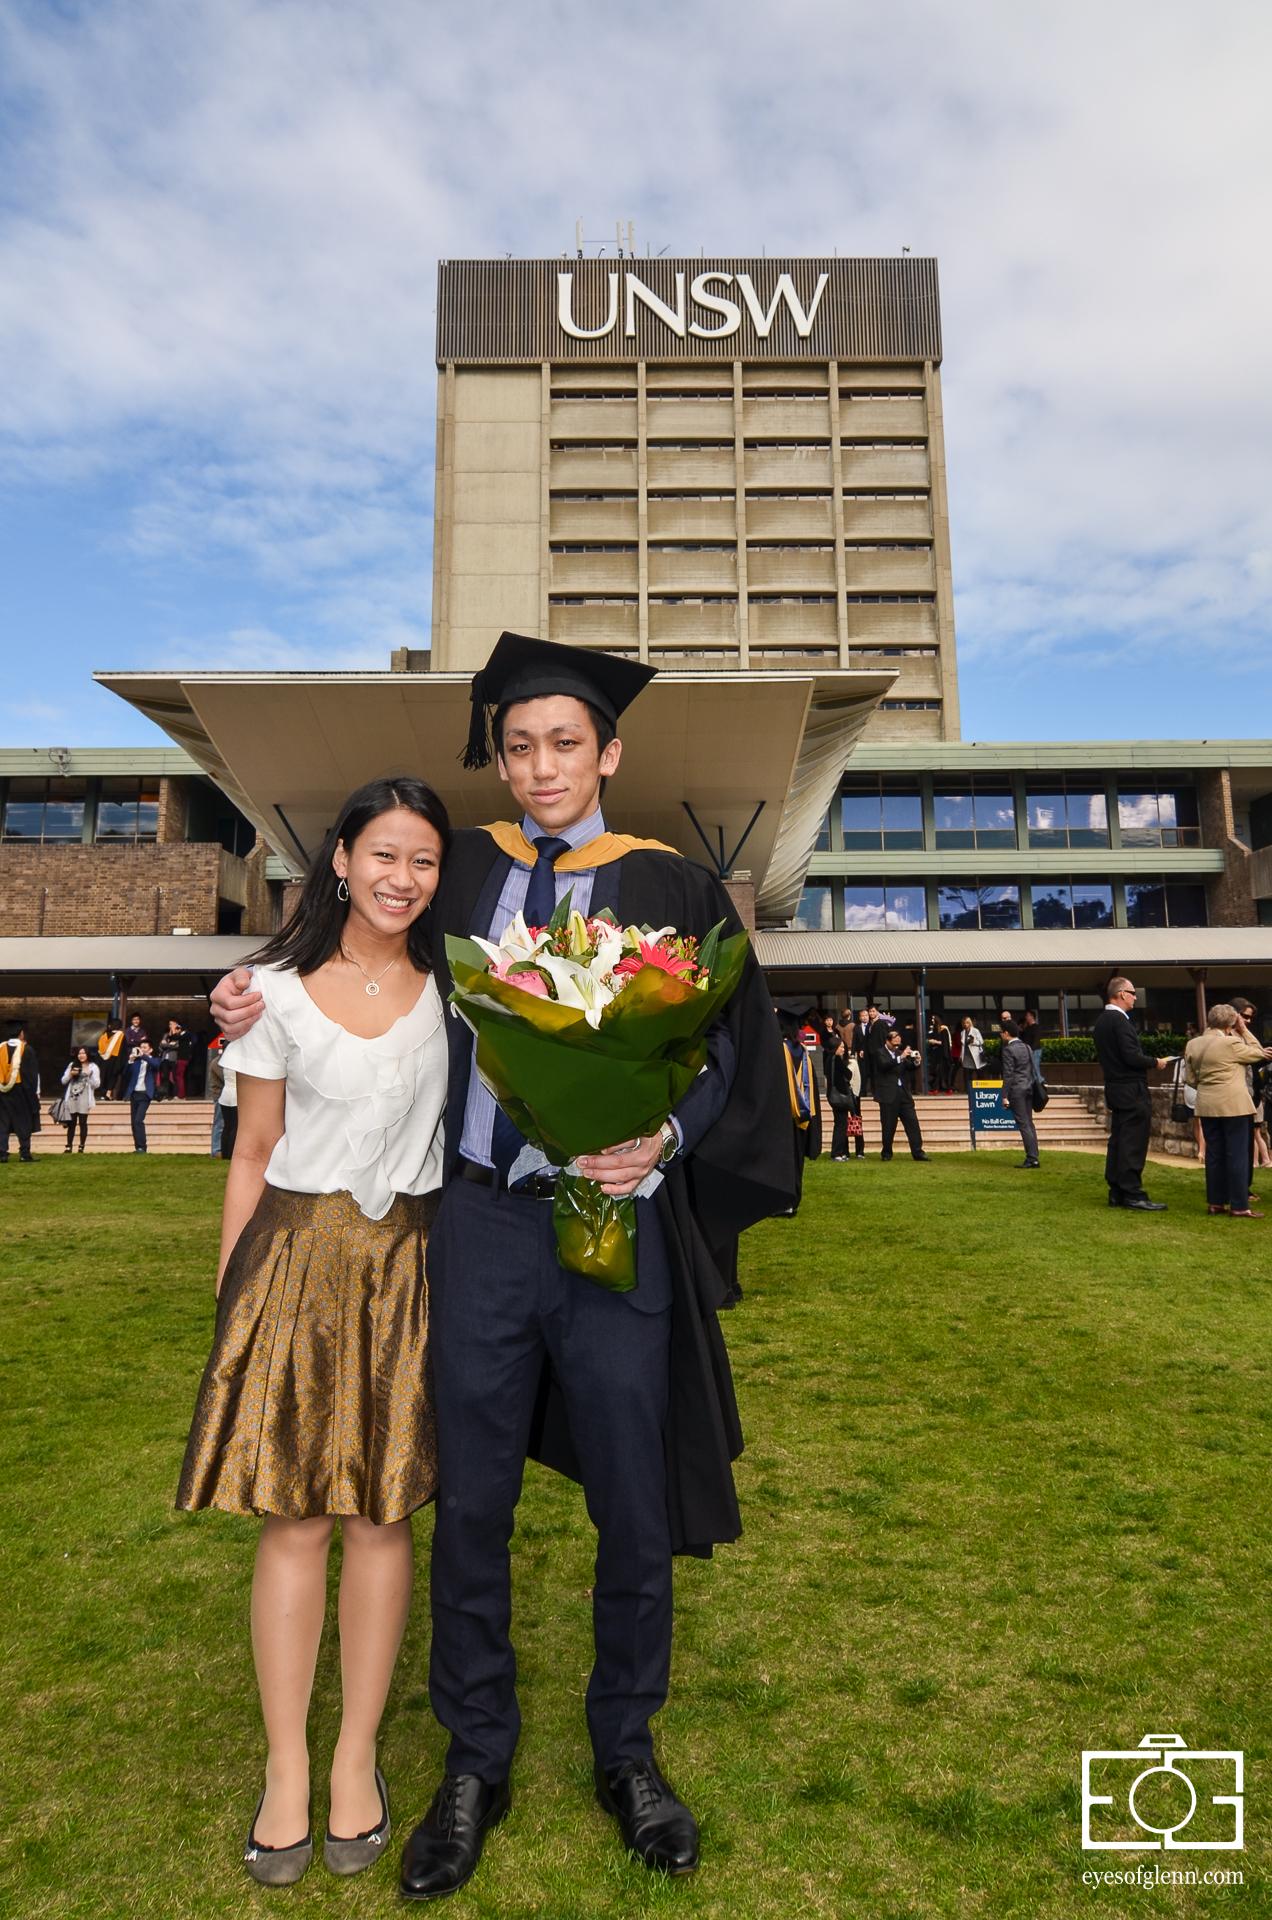 Law Graduate UNSW